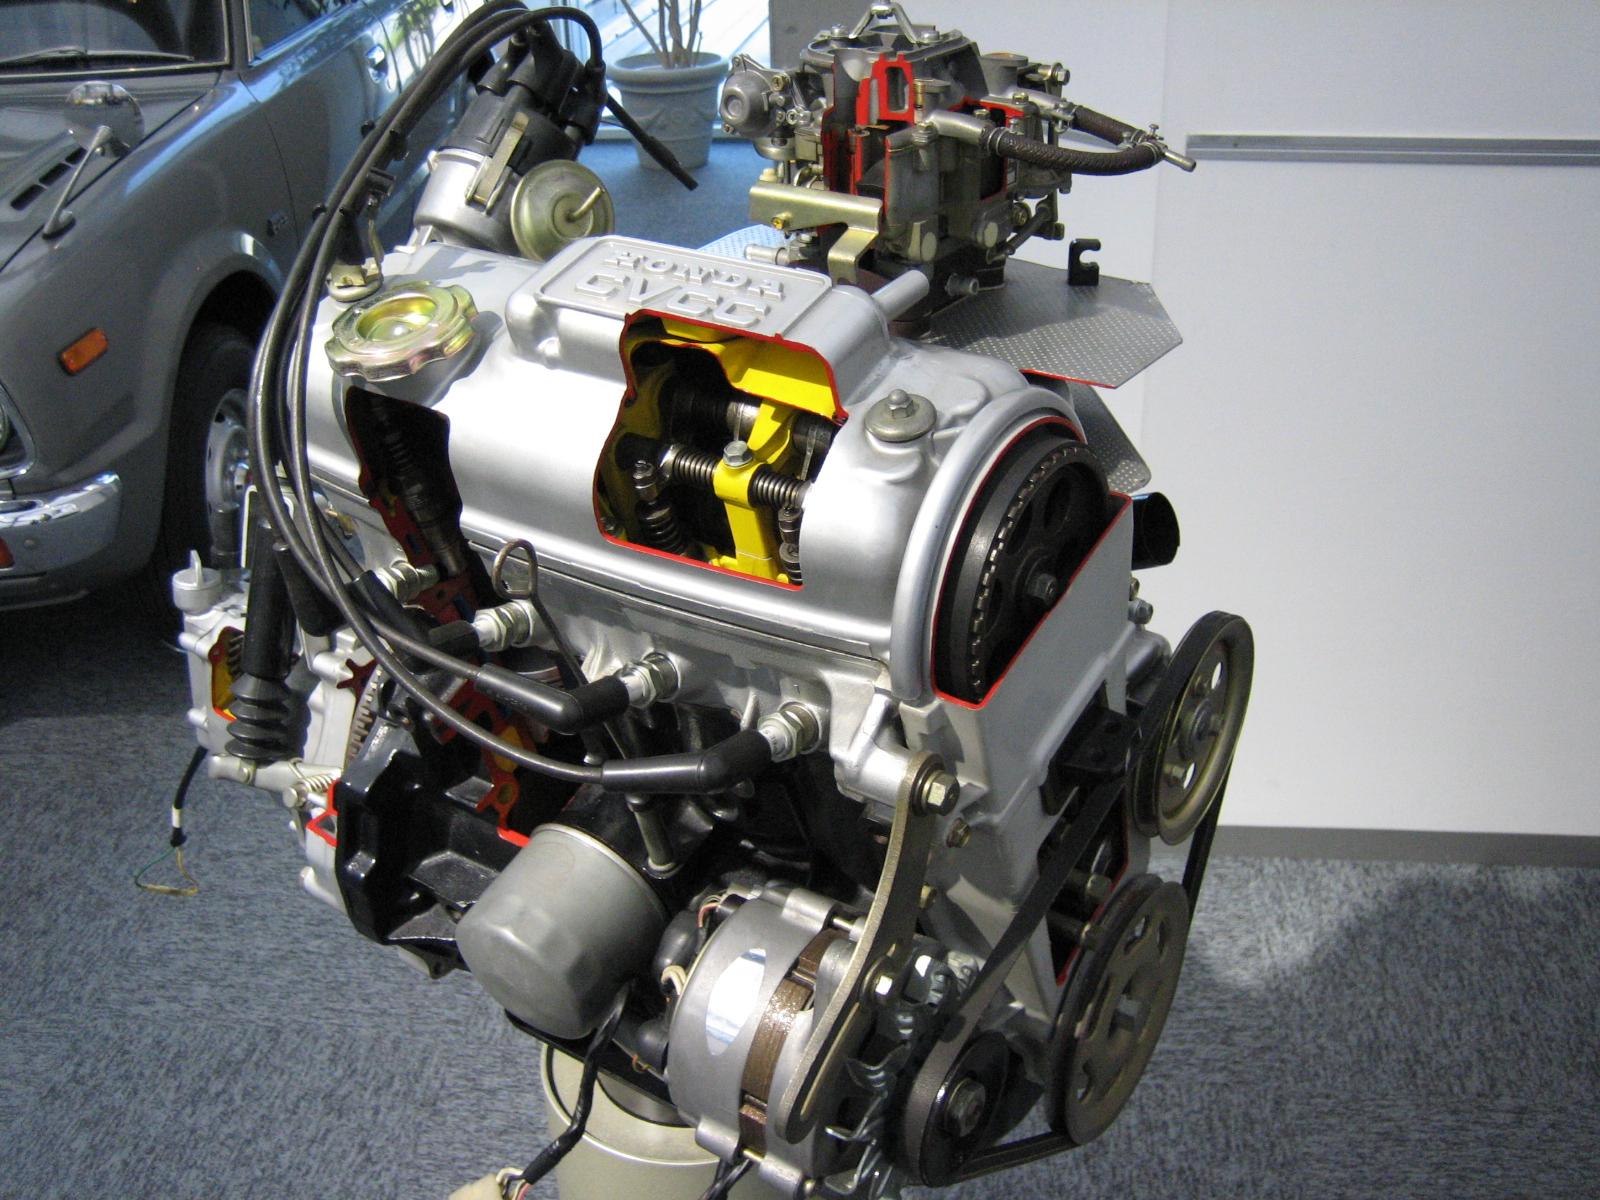 [DIAGRAM_38YU]  CVCC - Wikipedia | 1986 Honda Civic Engine Diagram |  | Wikipedia